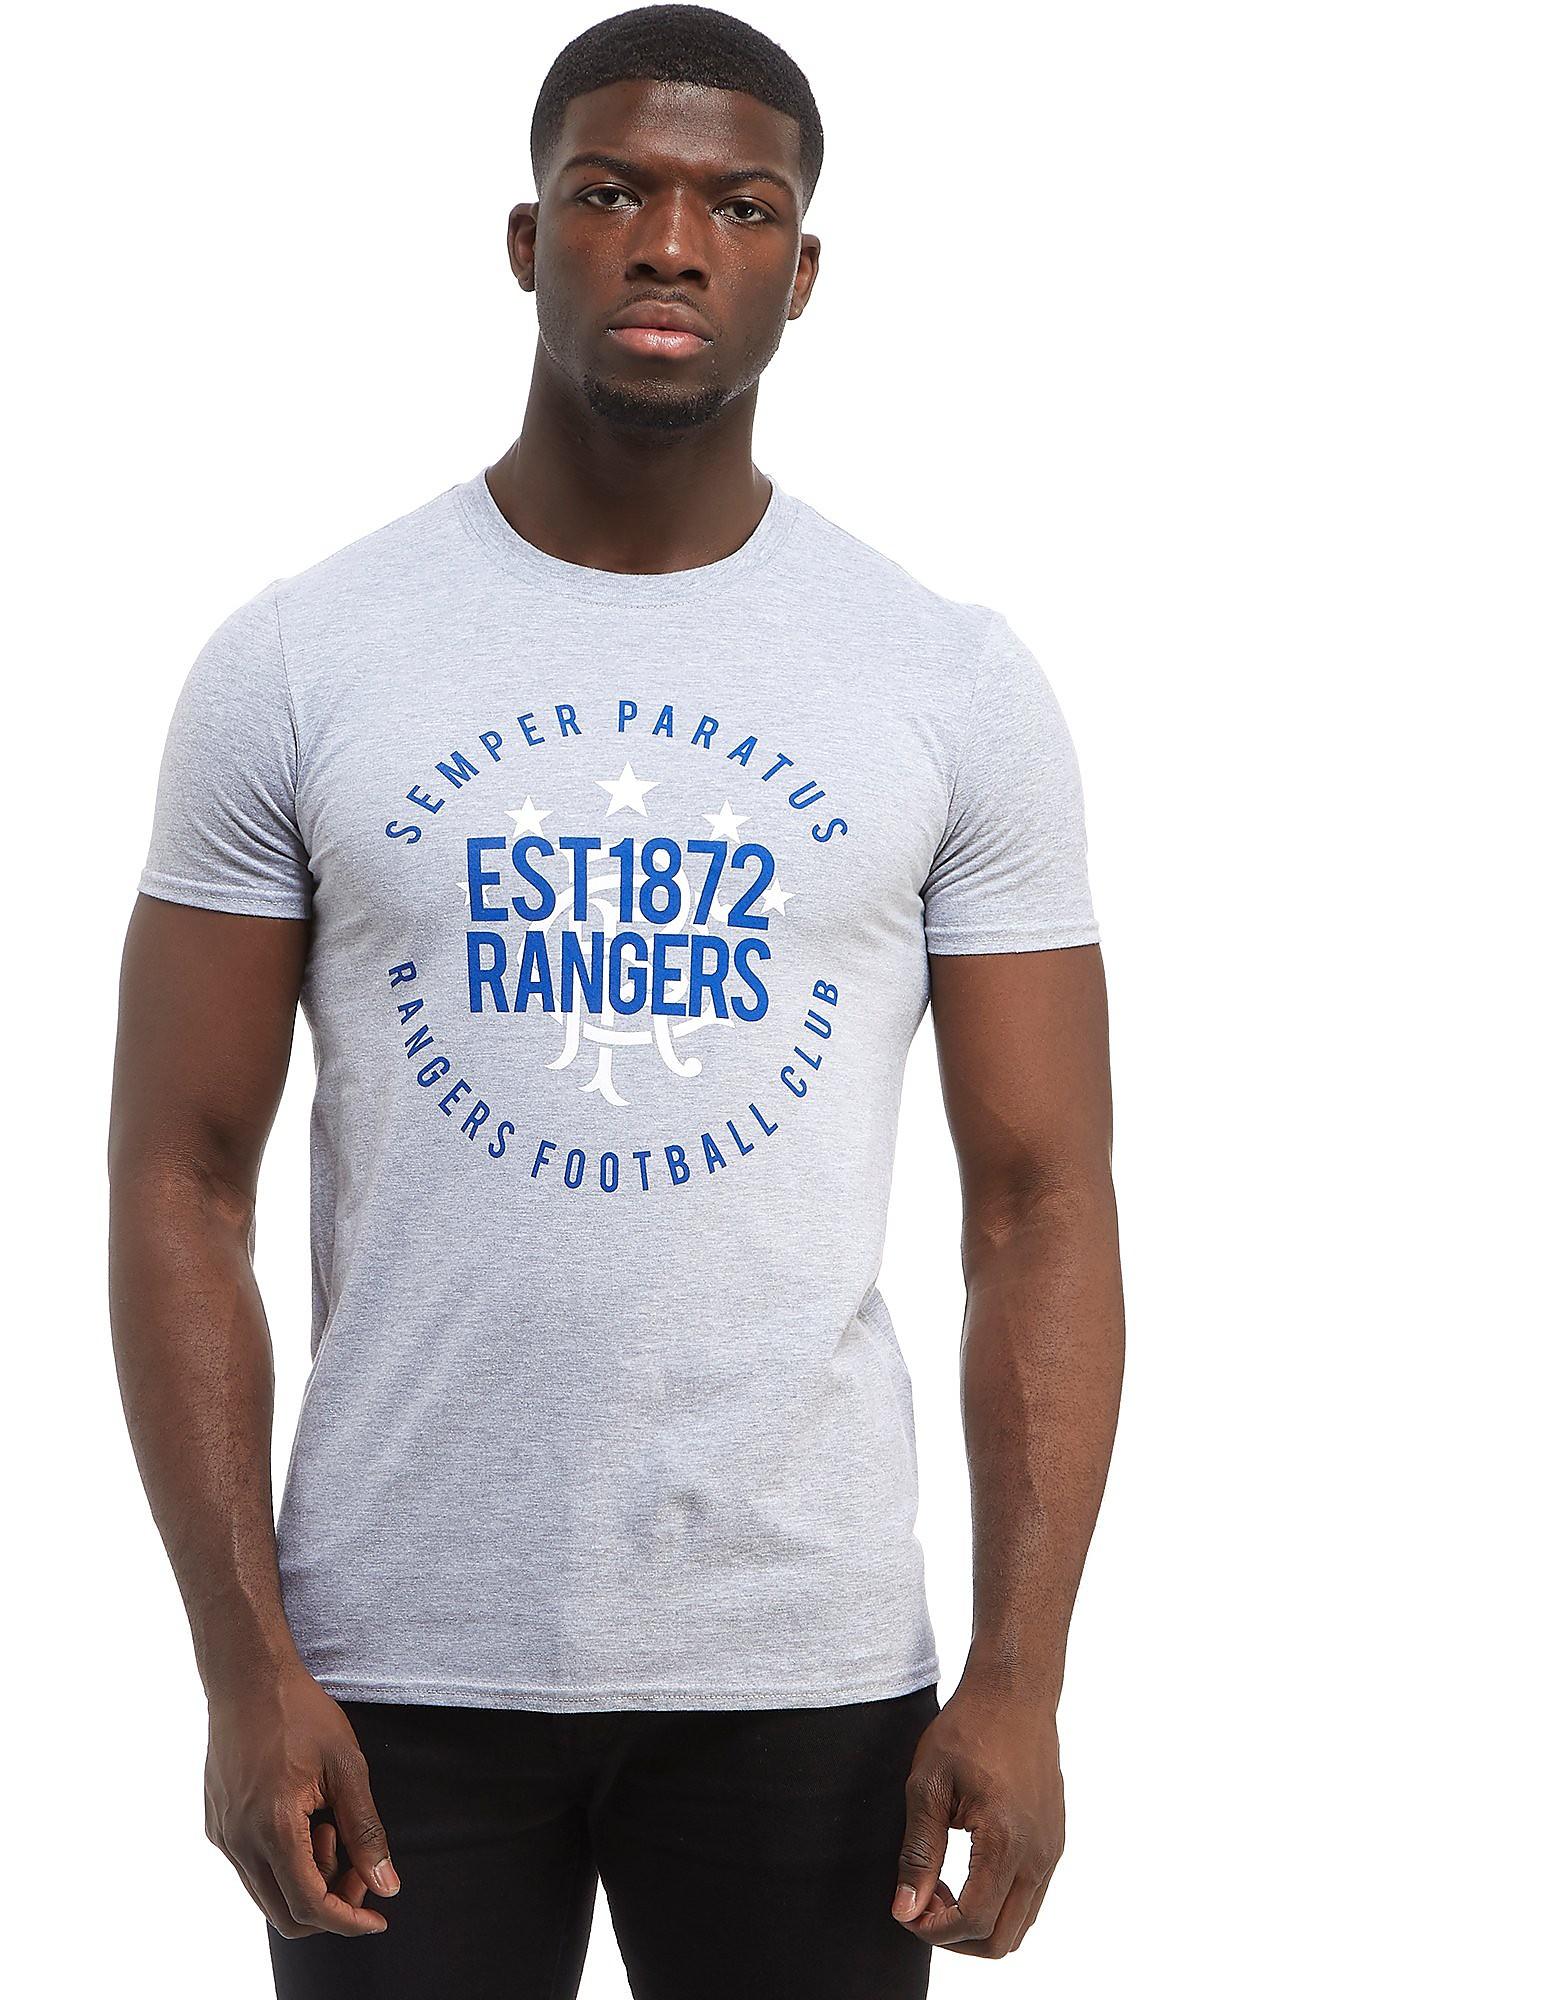 Official Team Rangers FC Established 1872 T-Shirt Heren - Grijs - Heren